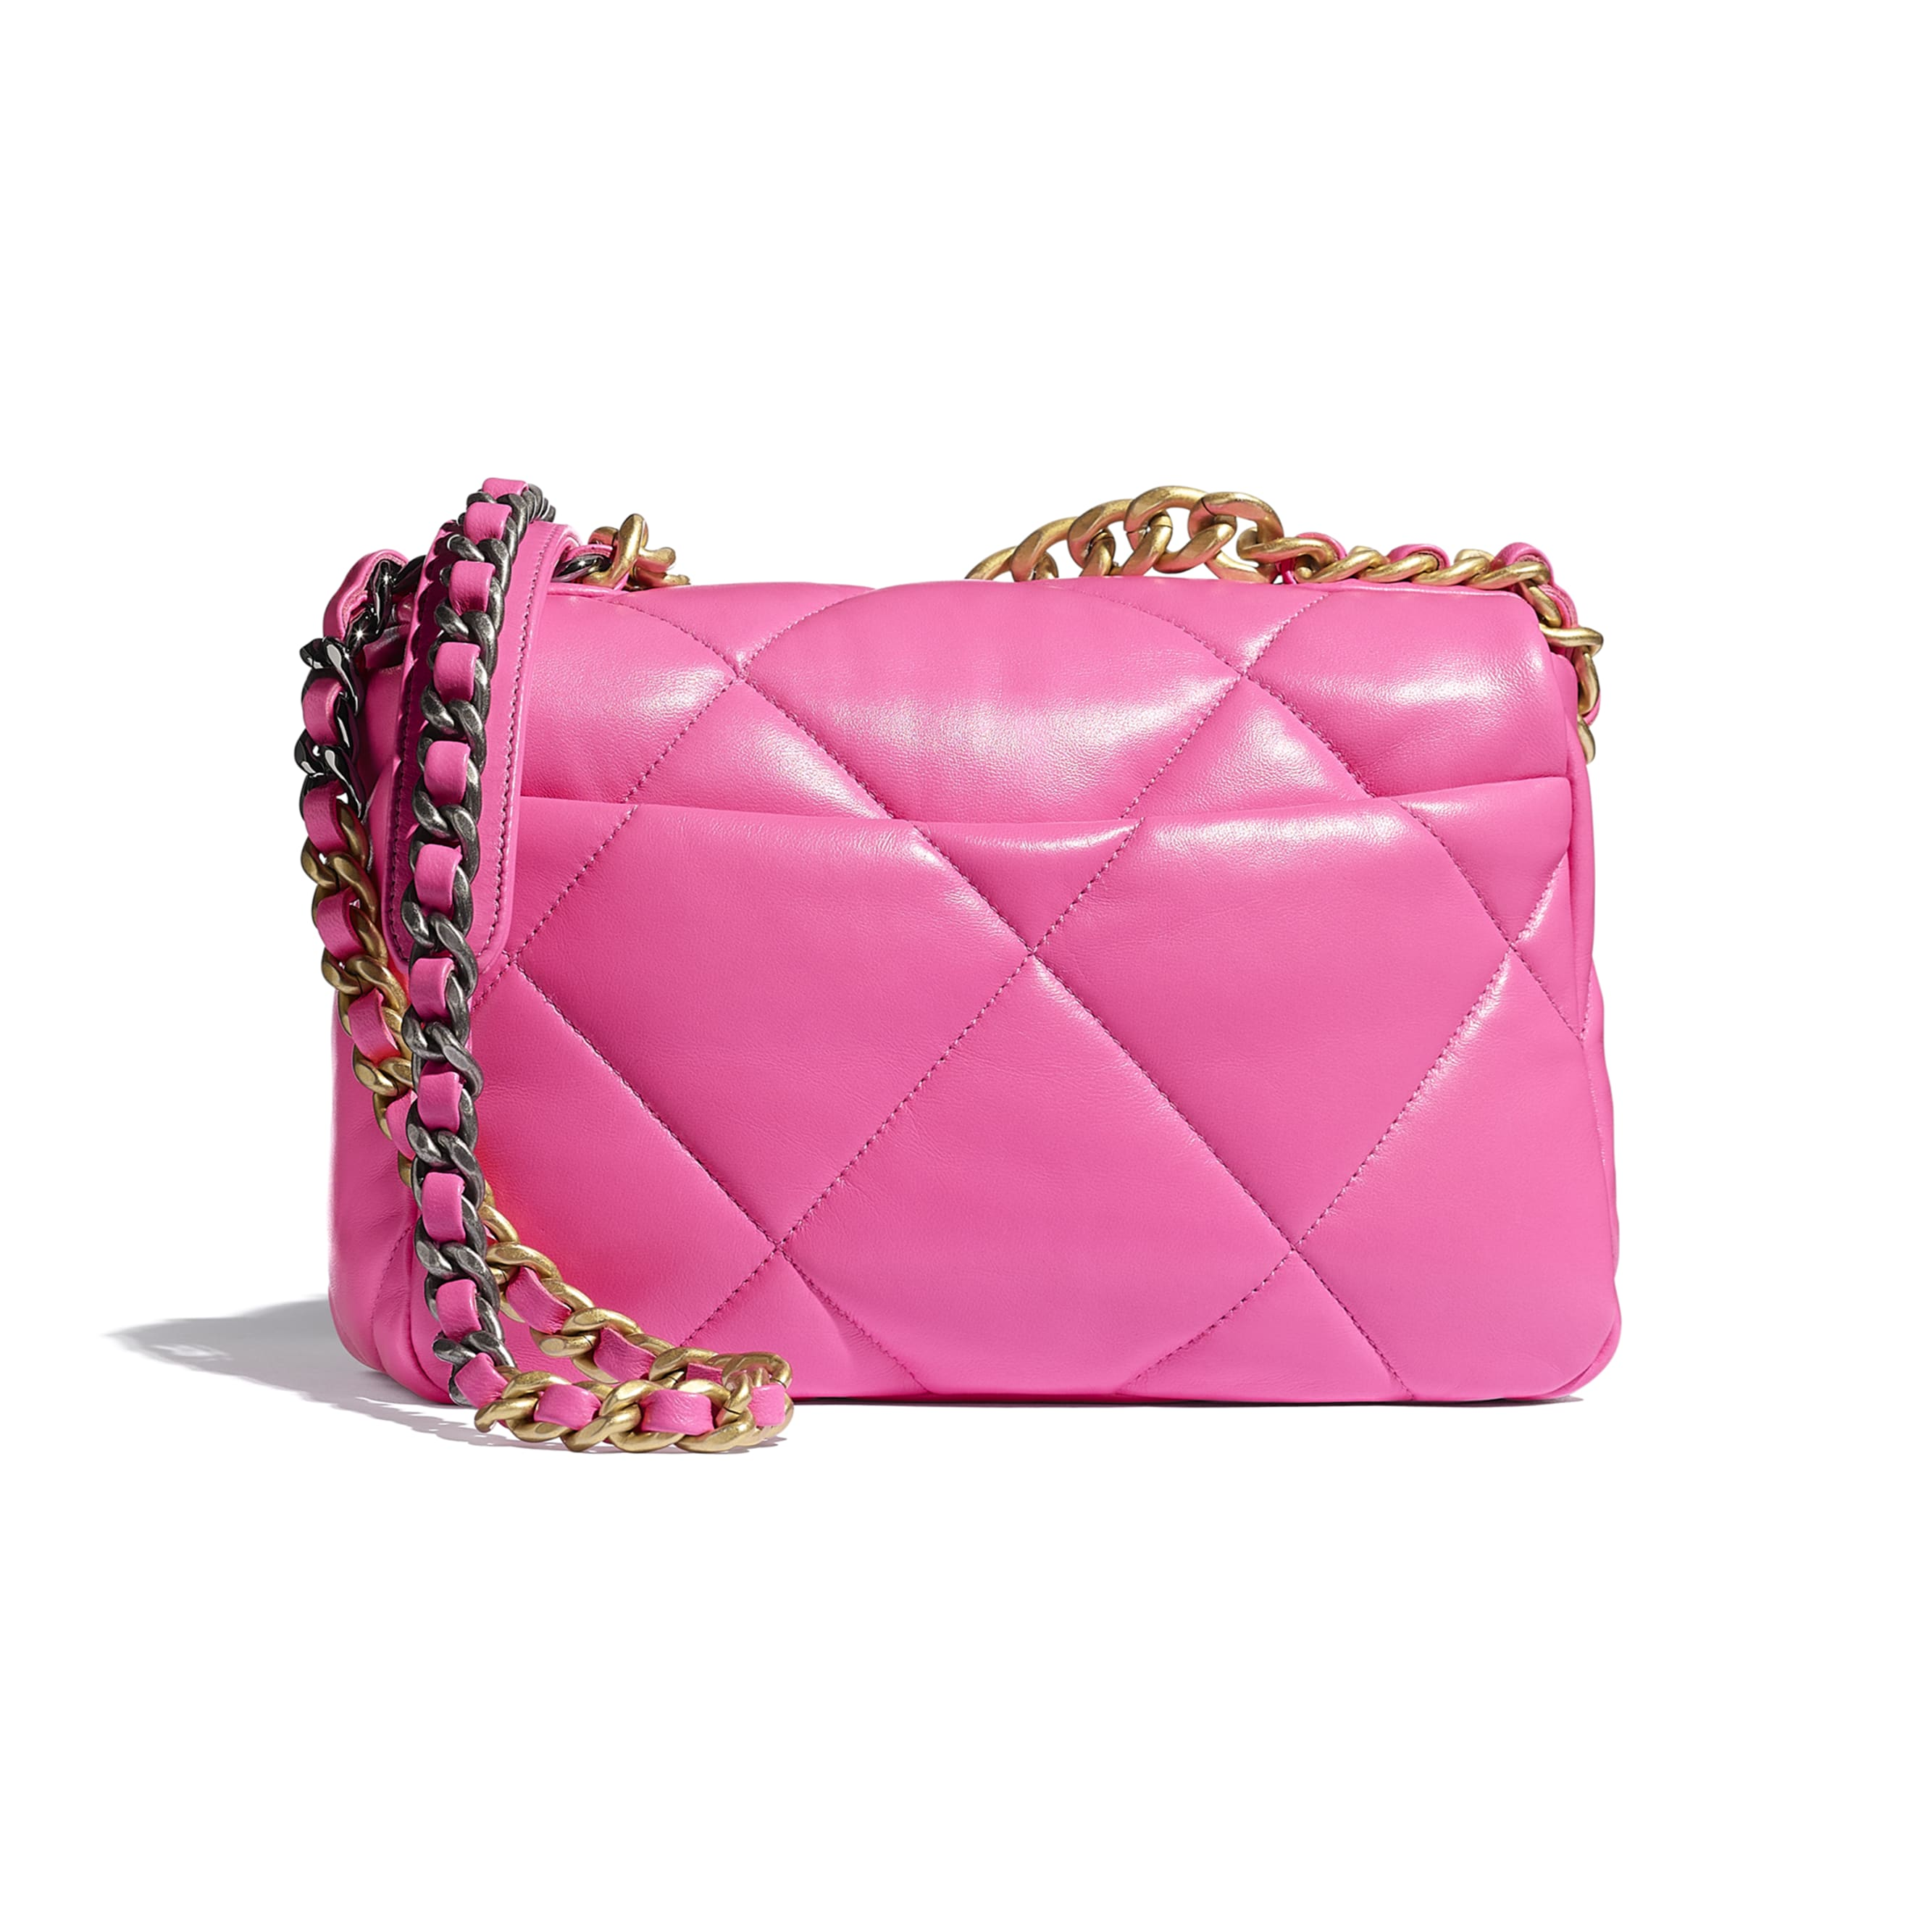 CHANEL 19 Handbag - Neon Pink - Shiny Lambskin, Gold-Tone, Silver-Tone & Ruthenium-Finish Metal - CHANEL - Alternative view - see standard sized version